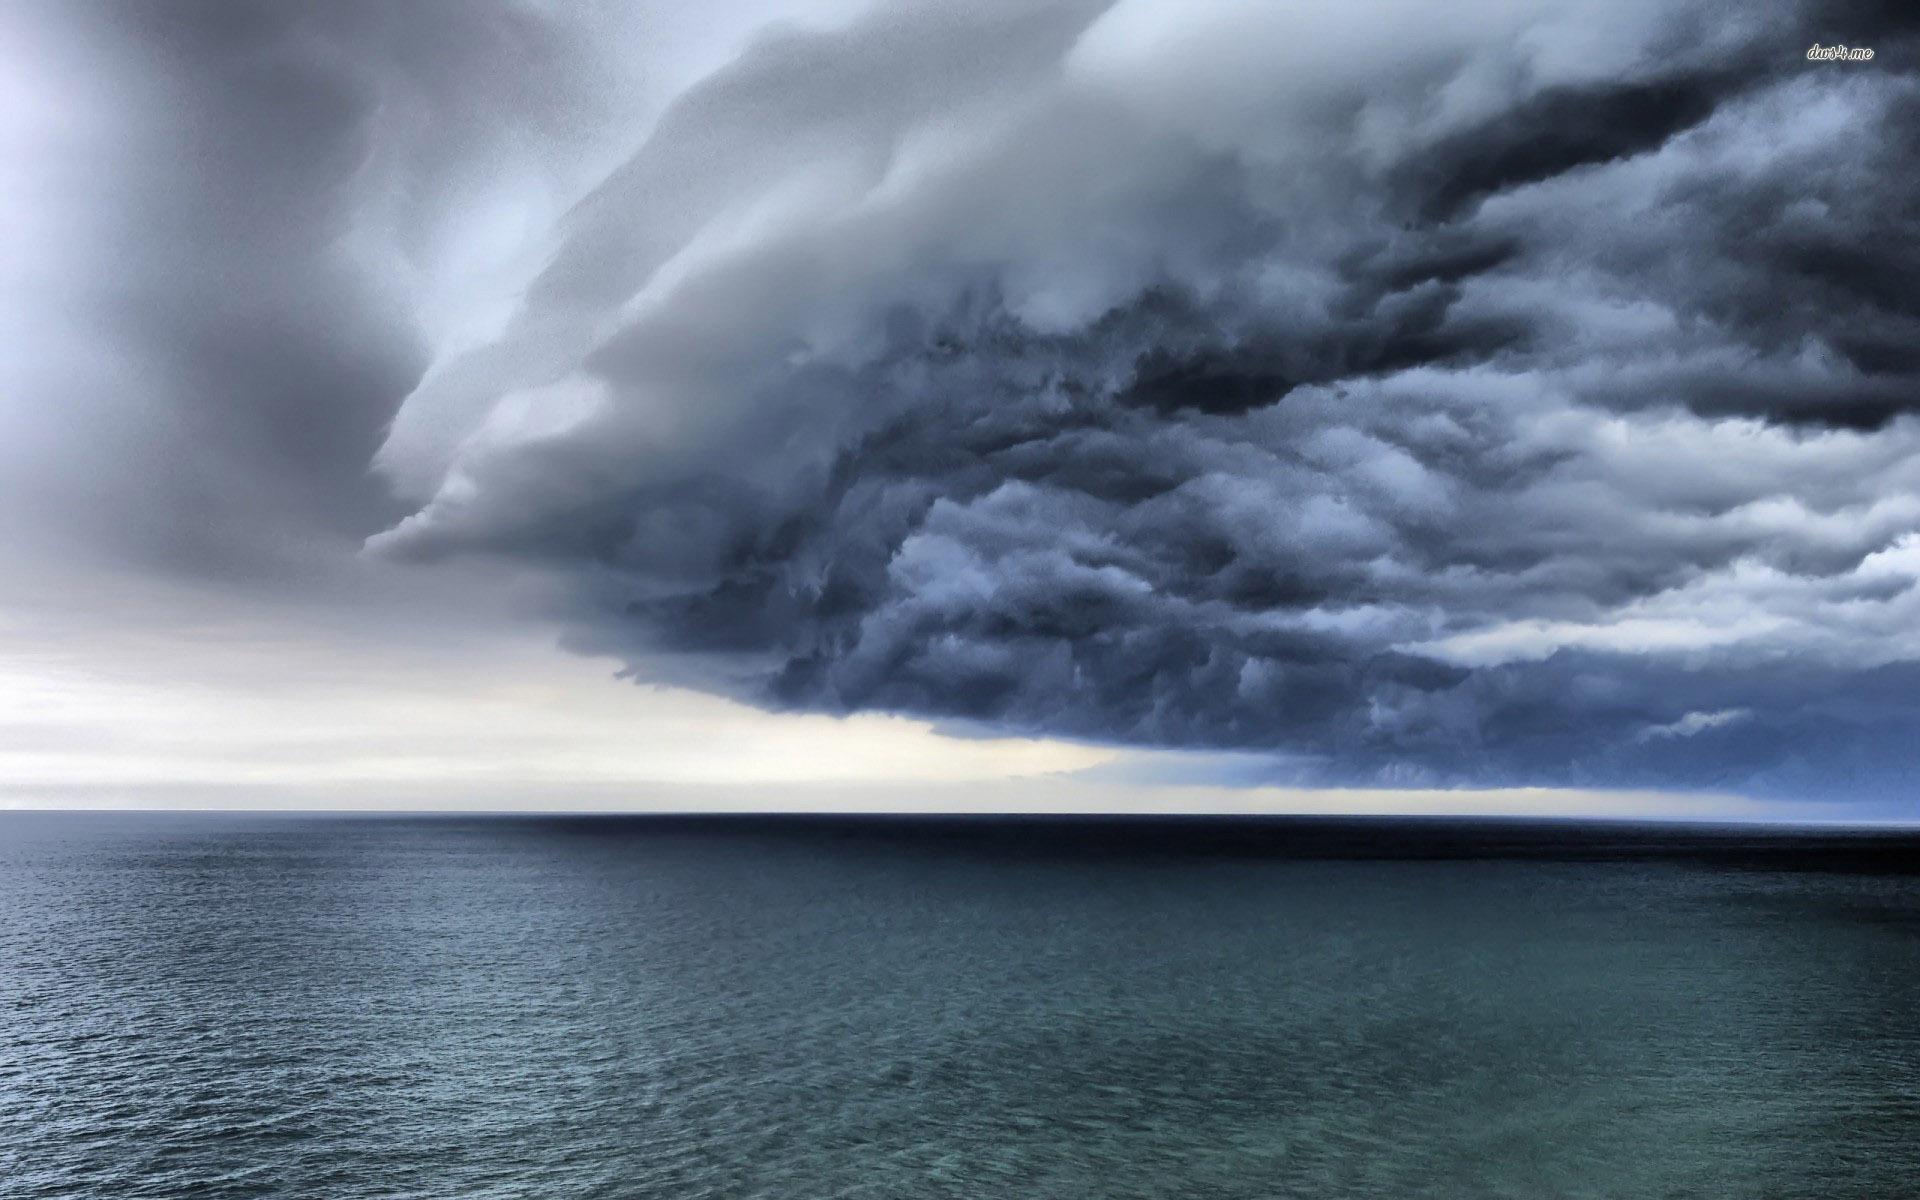 Ocean Storm Clouds Wallpaper 1920x1200 31205